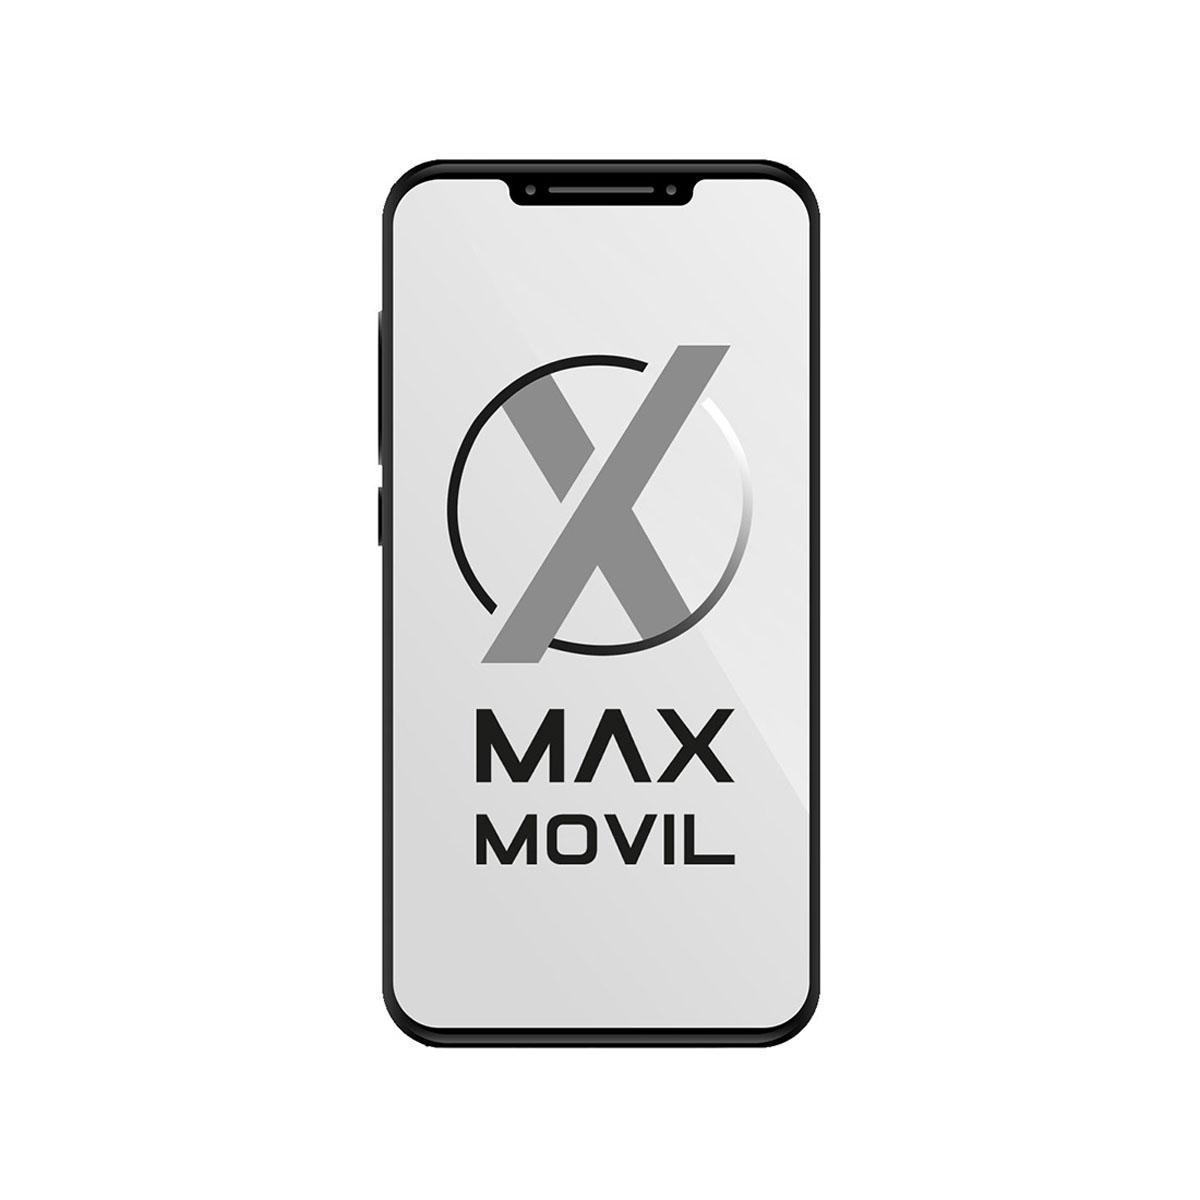 Huawei Mate 20 Pro 6GB/128GB Twilight Dual SIM LYA-LX9